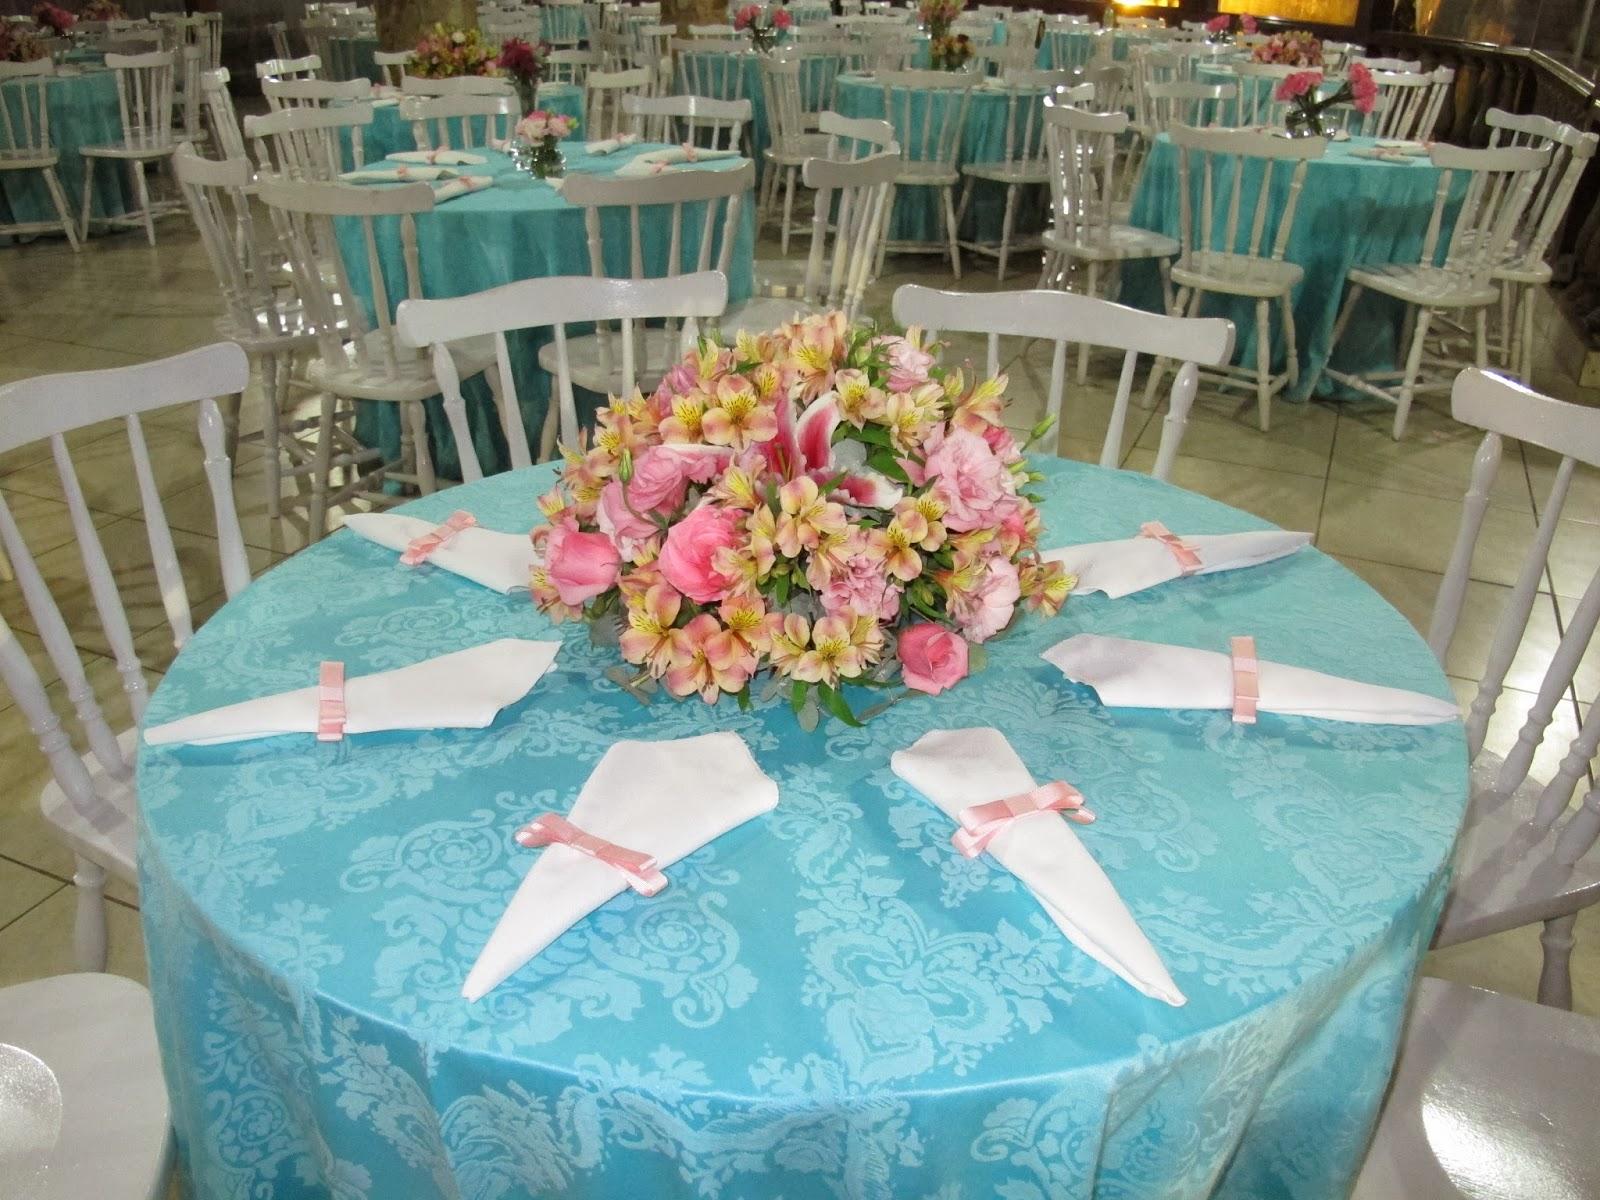 casamento azul tiffany rosa  2 jpg 1600 1200 more blue tiffany #3C858F 1600 1200